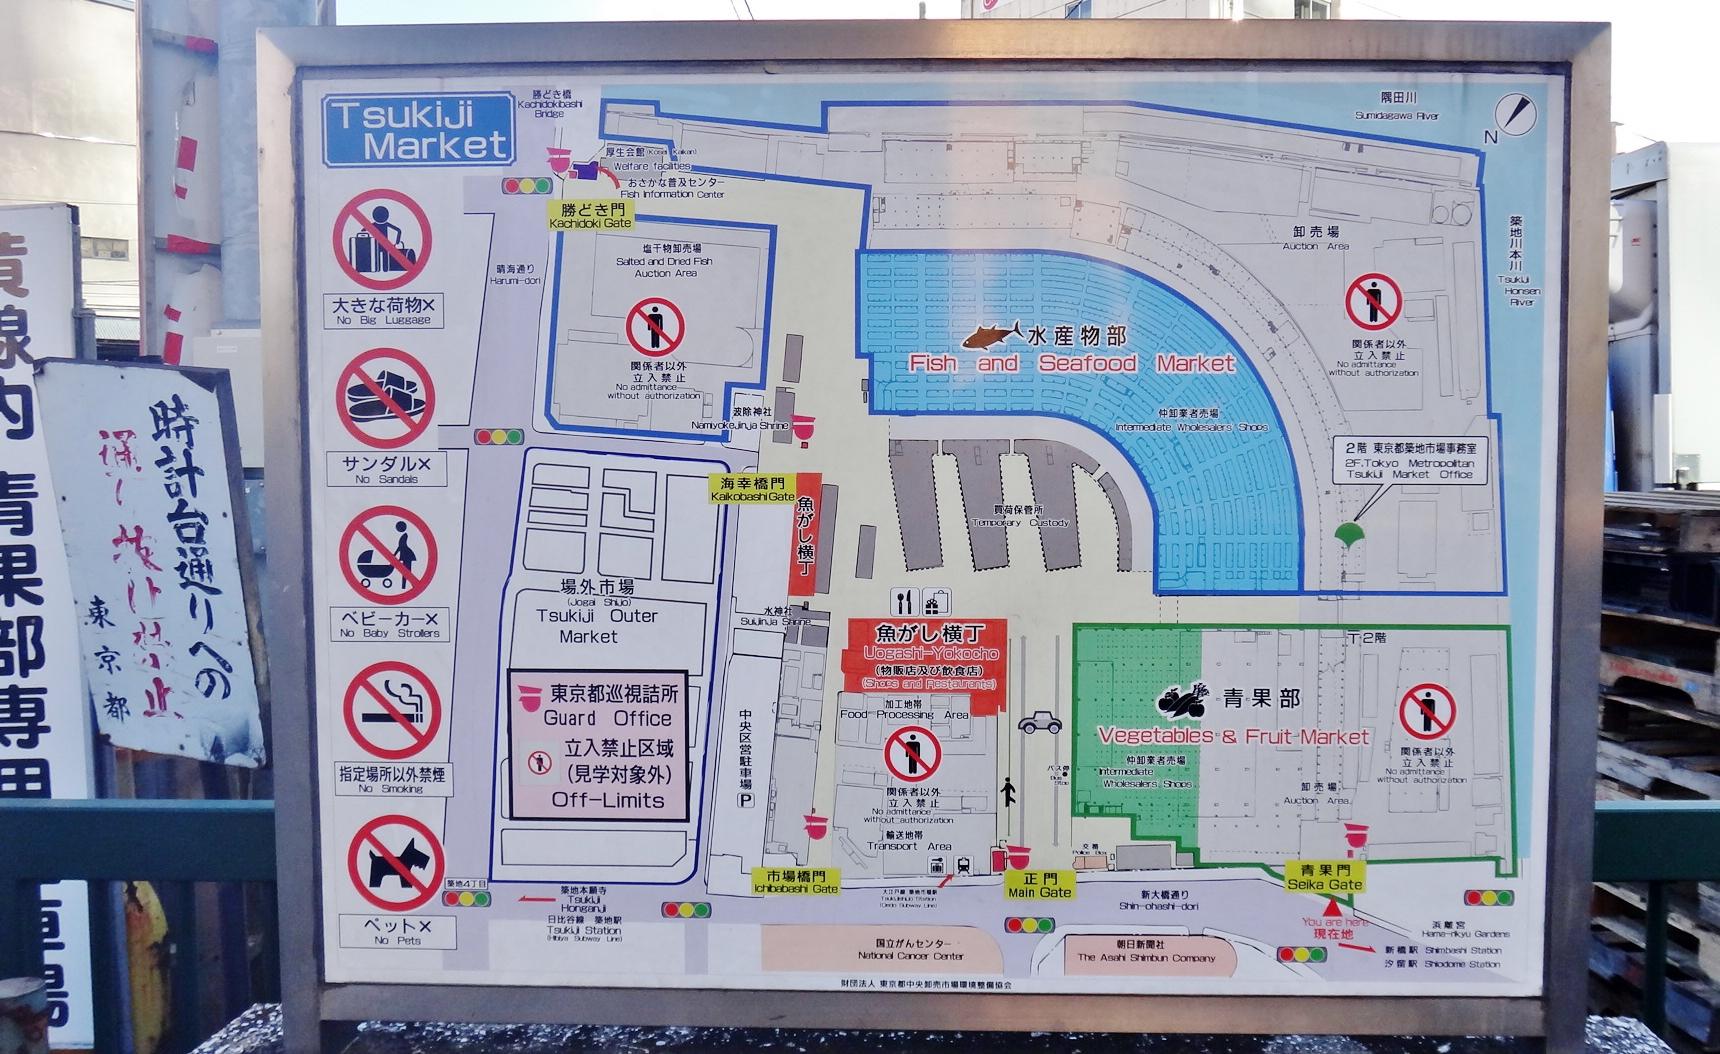 neighborhood maps with Tsukiji Fish Market Tokyo Map on Tsukiji Fish Market Tokyo Map further Location maps moreover Rocking Tom Ford besides File Seattle   Belltown map besides 134 Djerba.